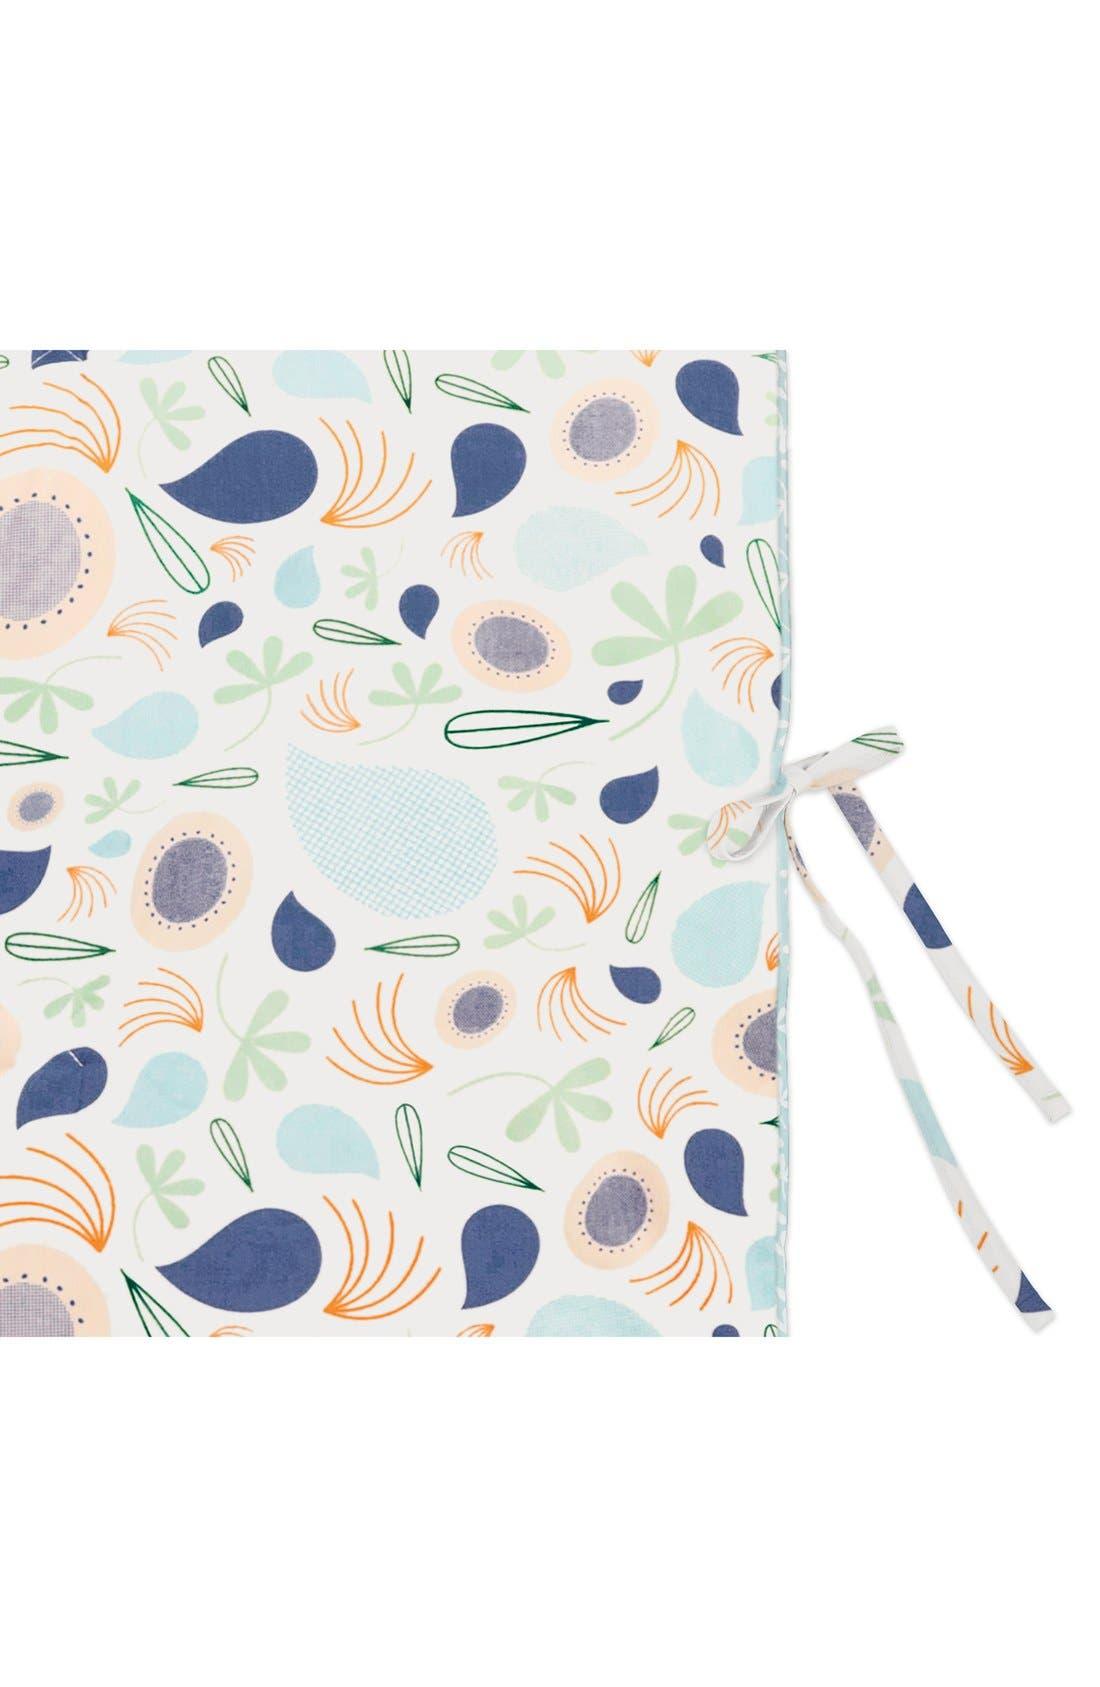 'Flora' Crib Sheet, Crib Skirt, Stroller Blanket & Wall Decals,                             Alternate thumbnail 5, color,                             Blue